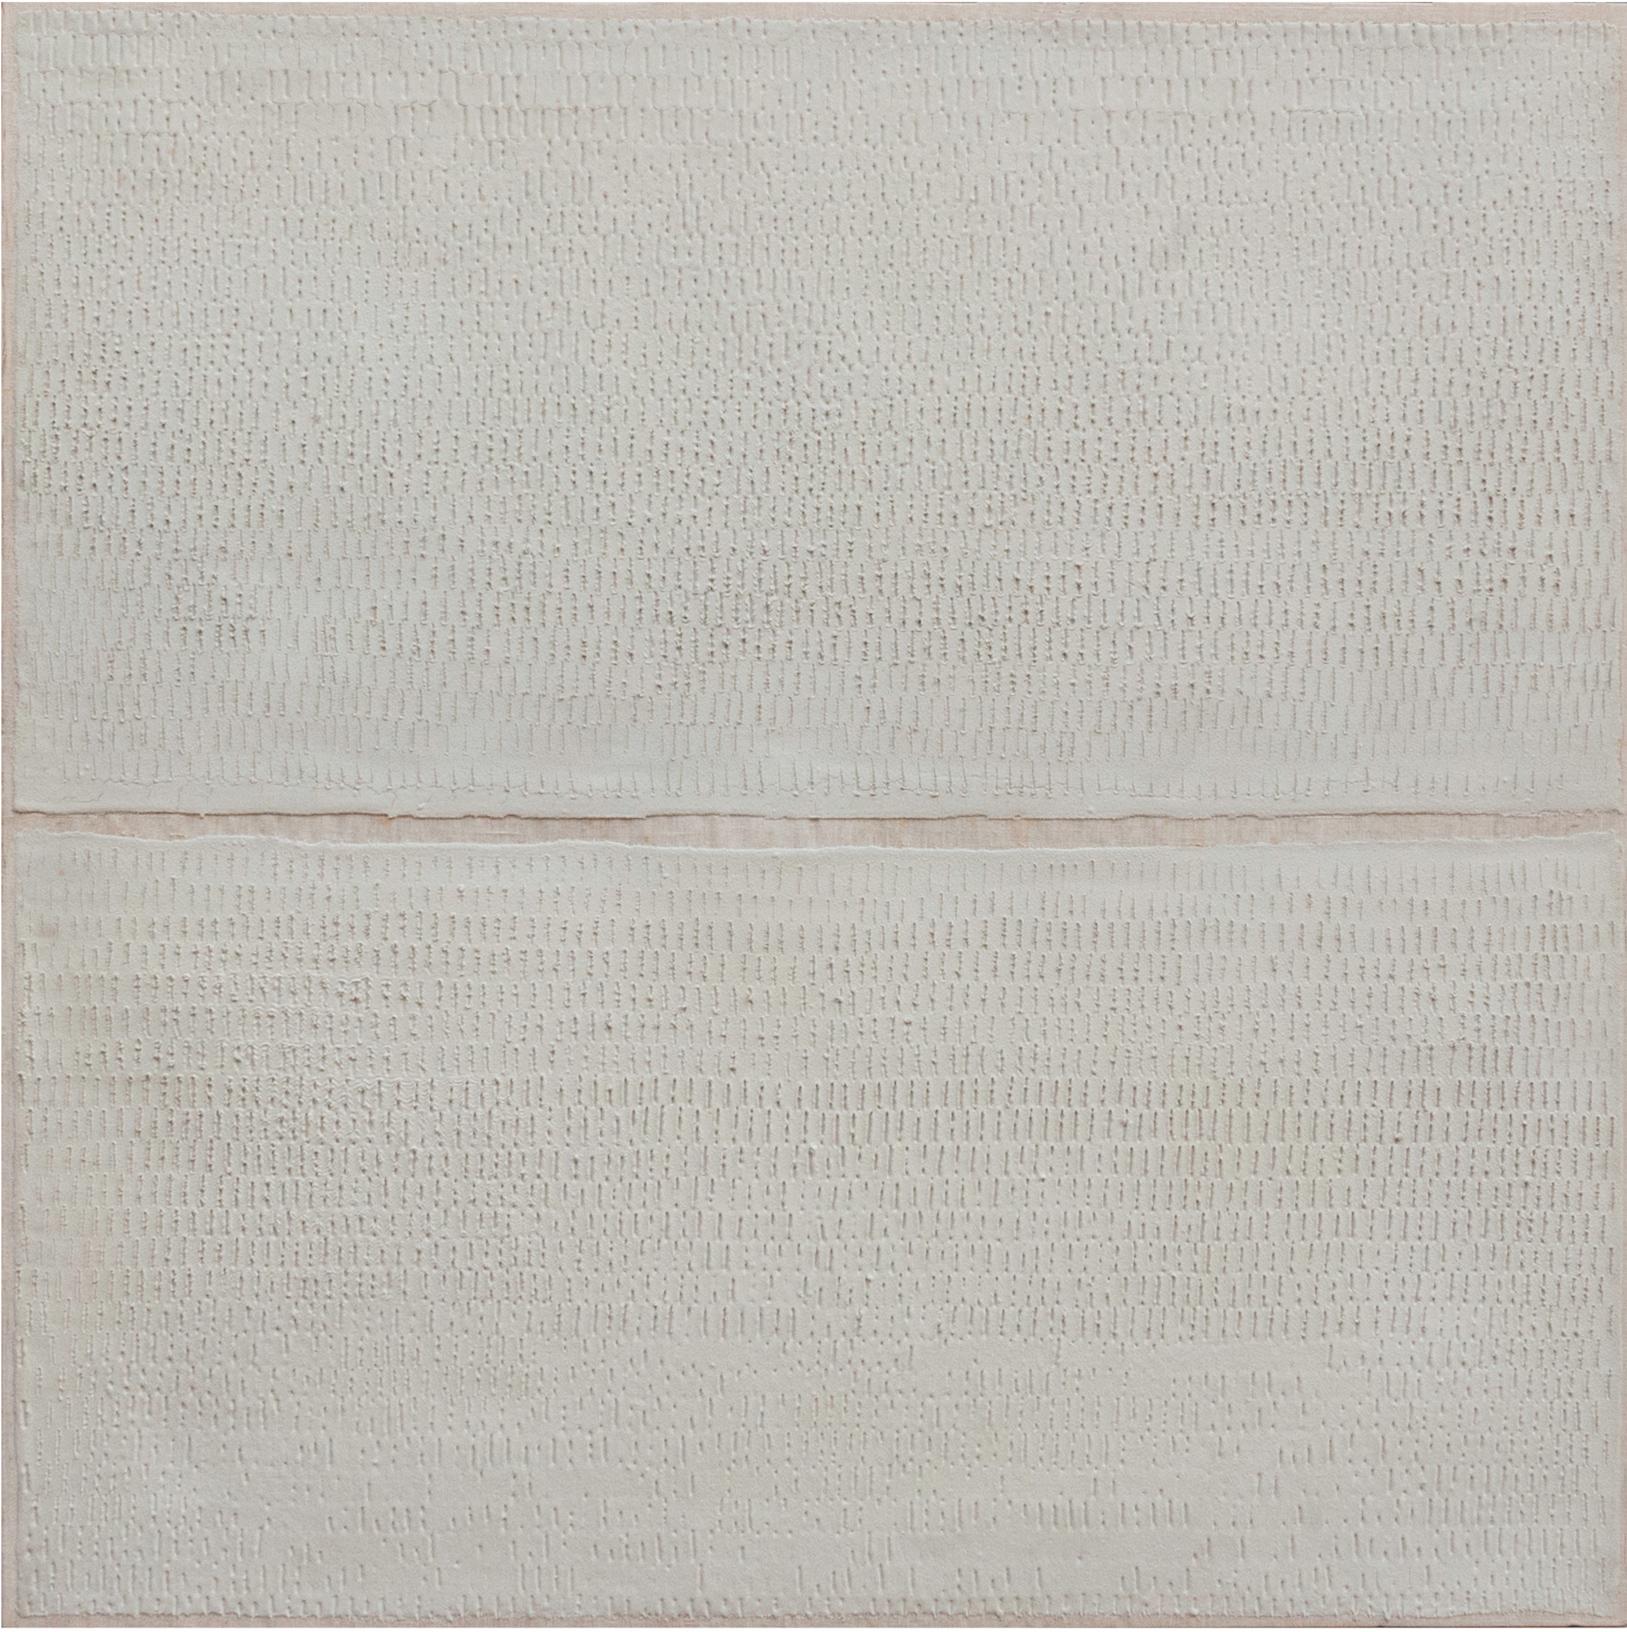 Bonamini-Eros_70C1275-un-segno-traccia-ogni-secondo_1975_100x100cm